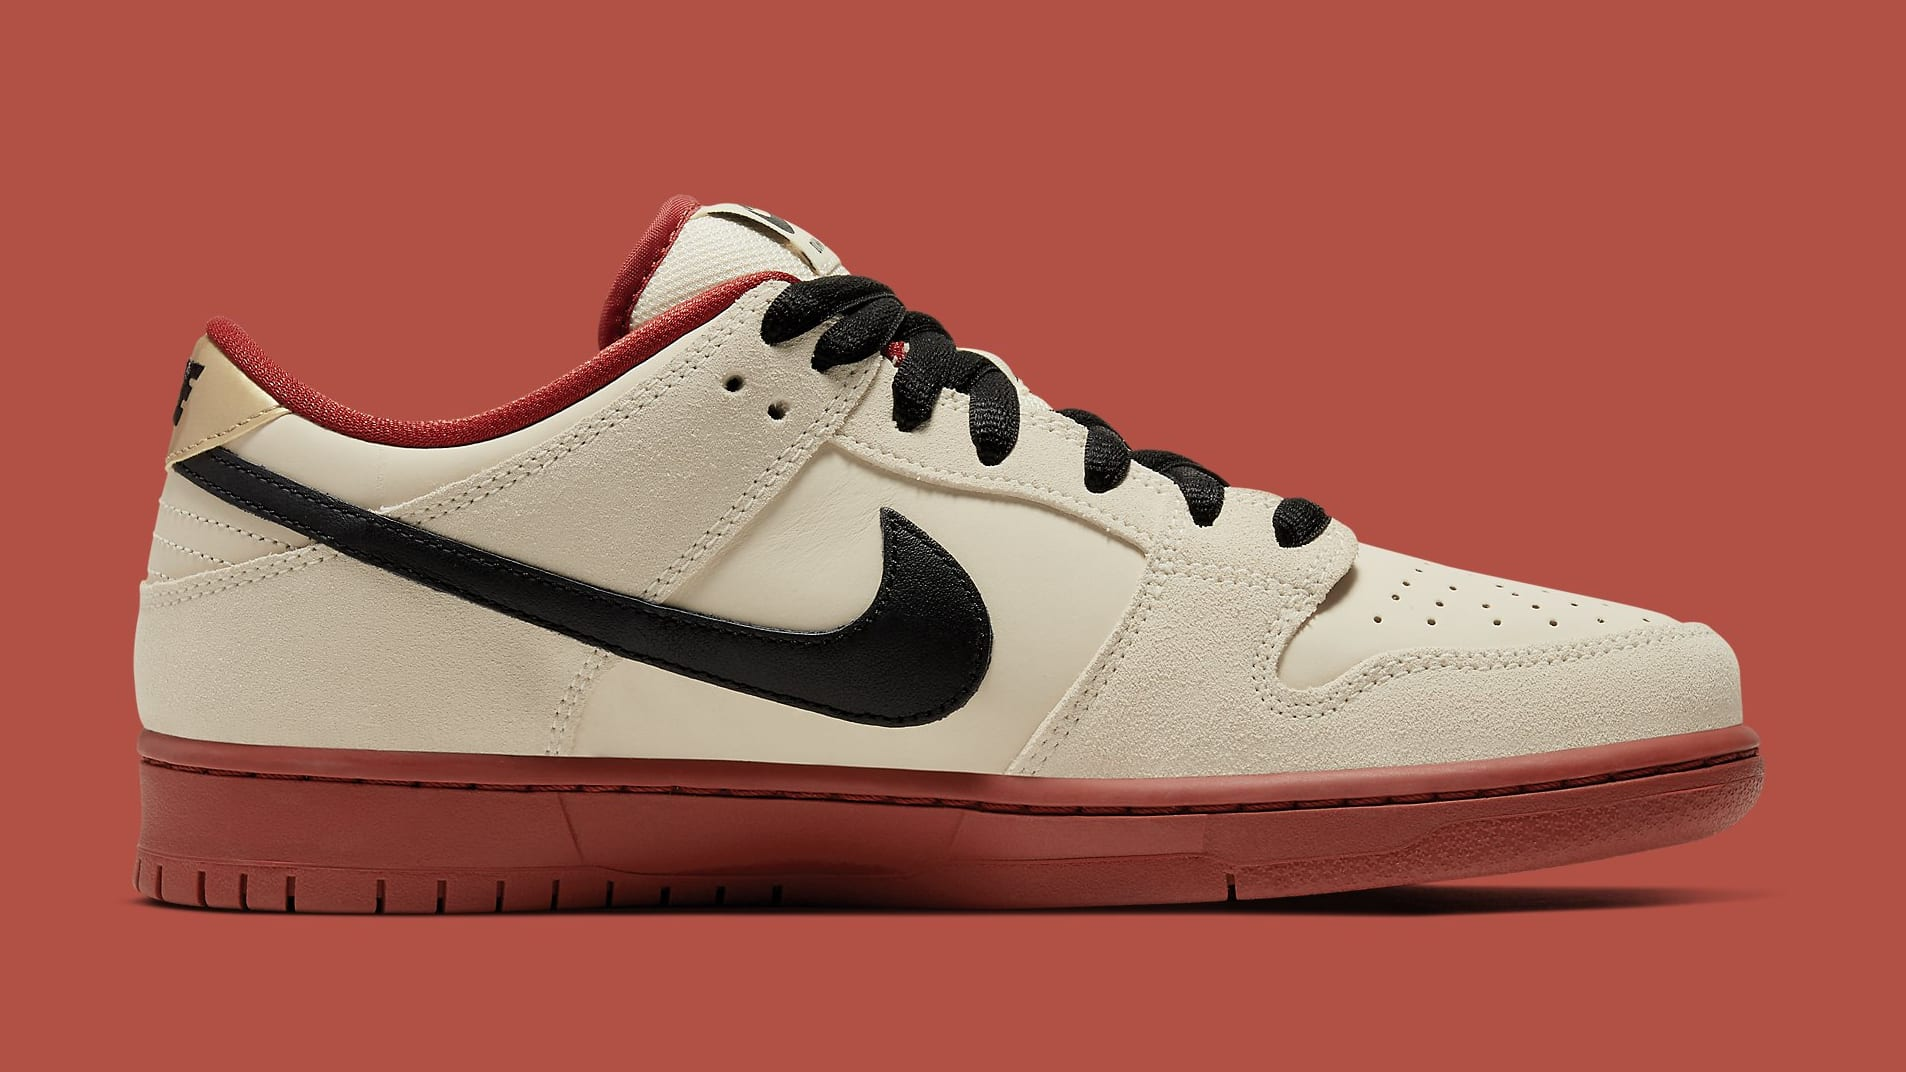 Nike SB Dunk Low 'Muslin' BQ6817-100 Medial